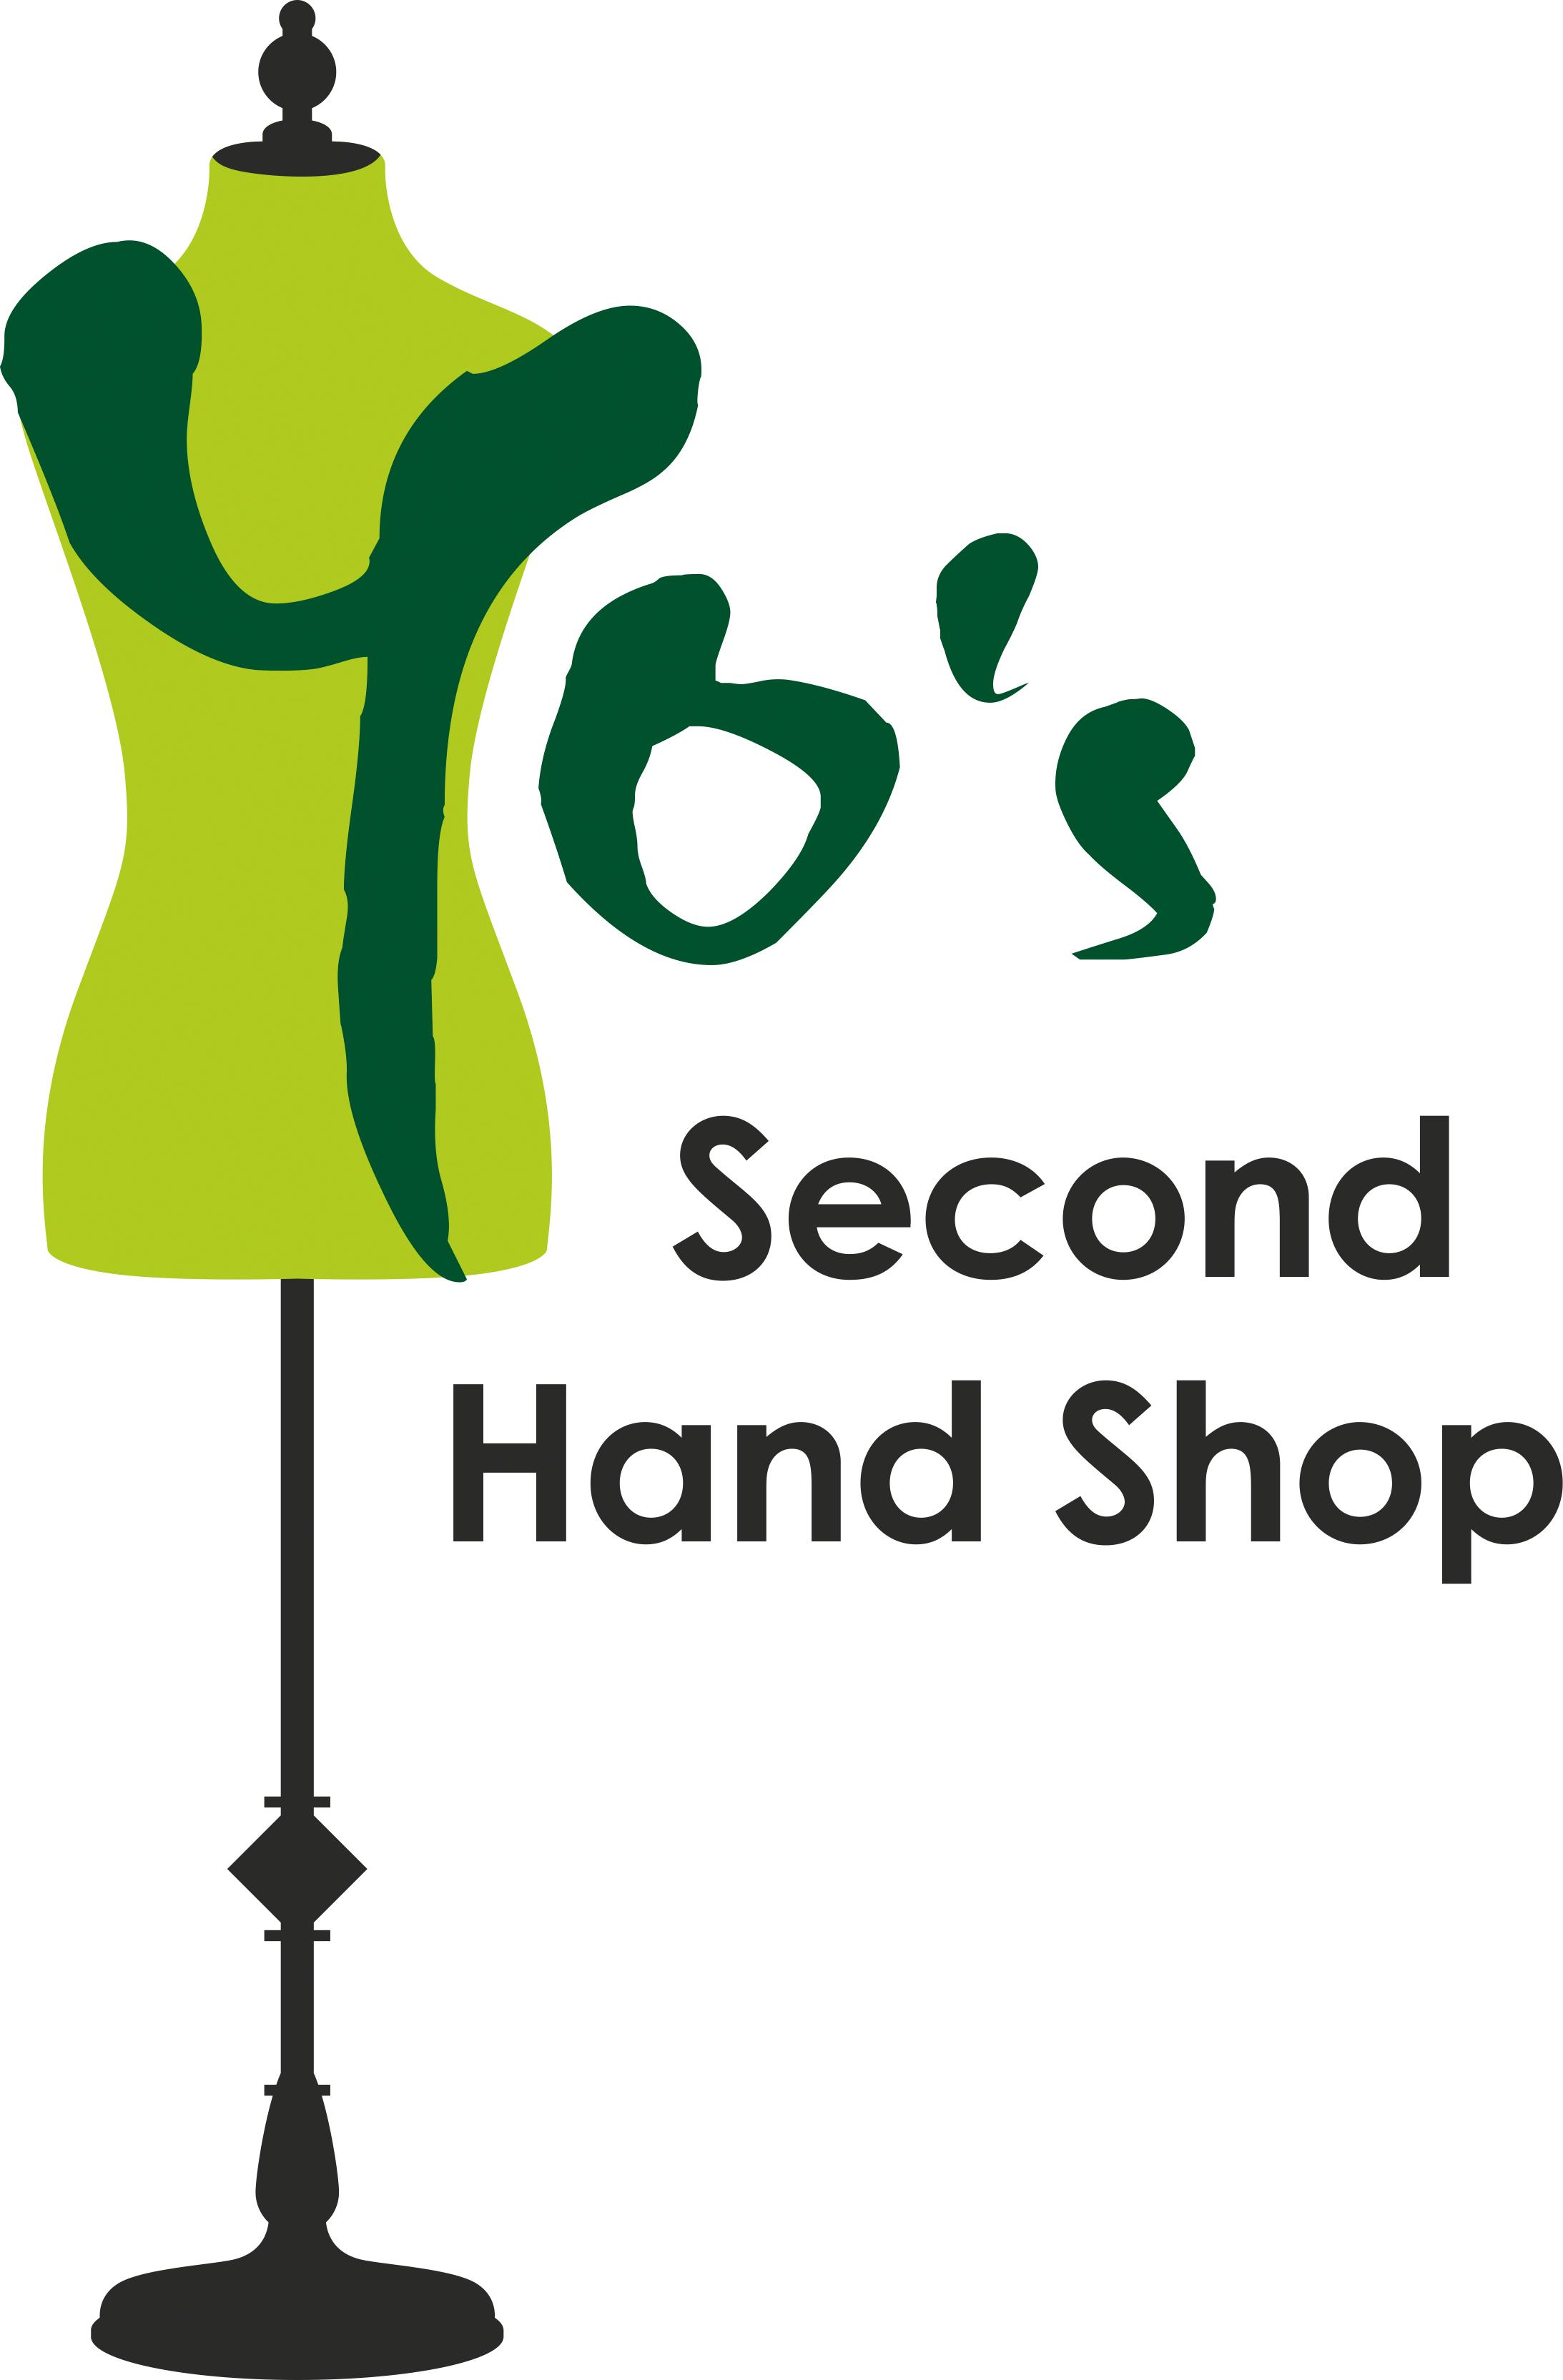 yos-second-hand-shop-logo-rz-1